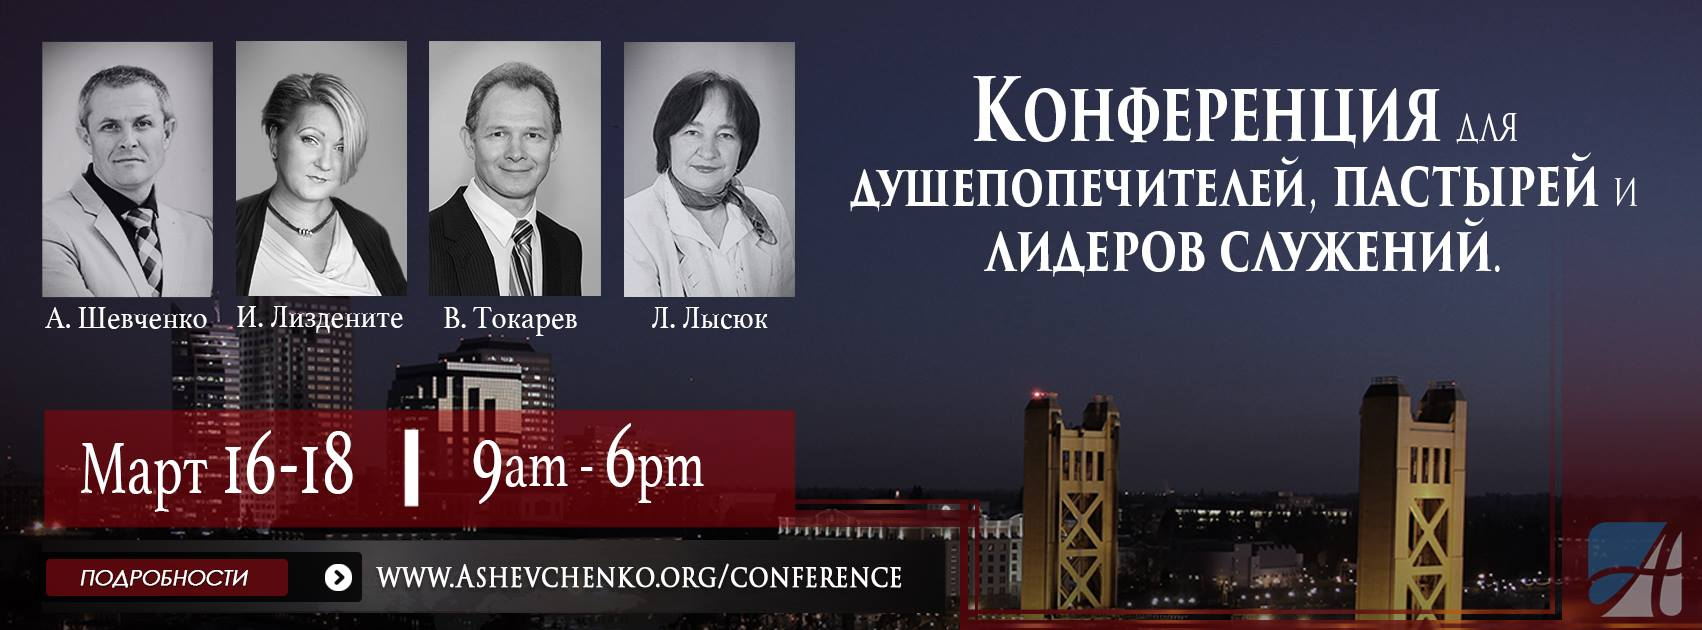 Shevchenko Conference